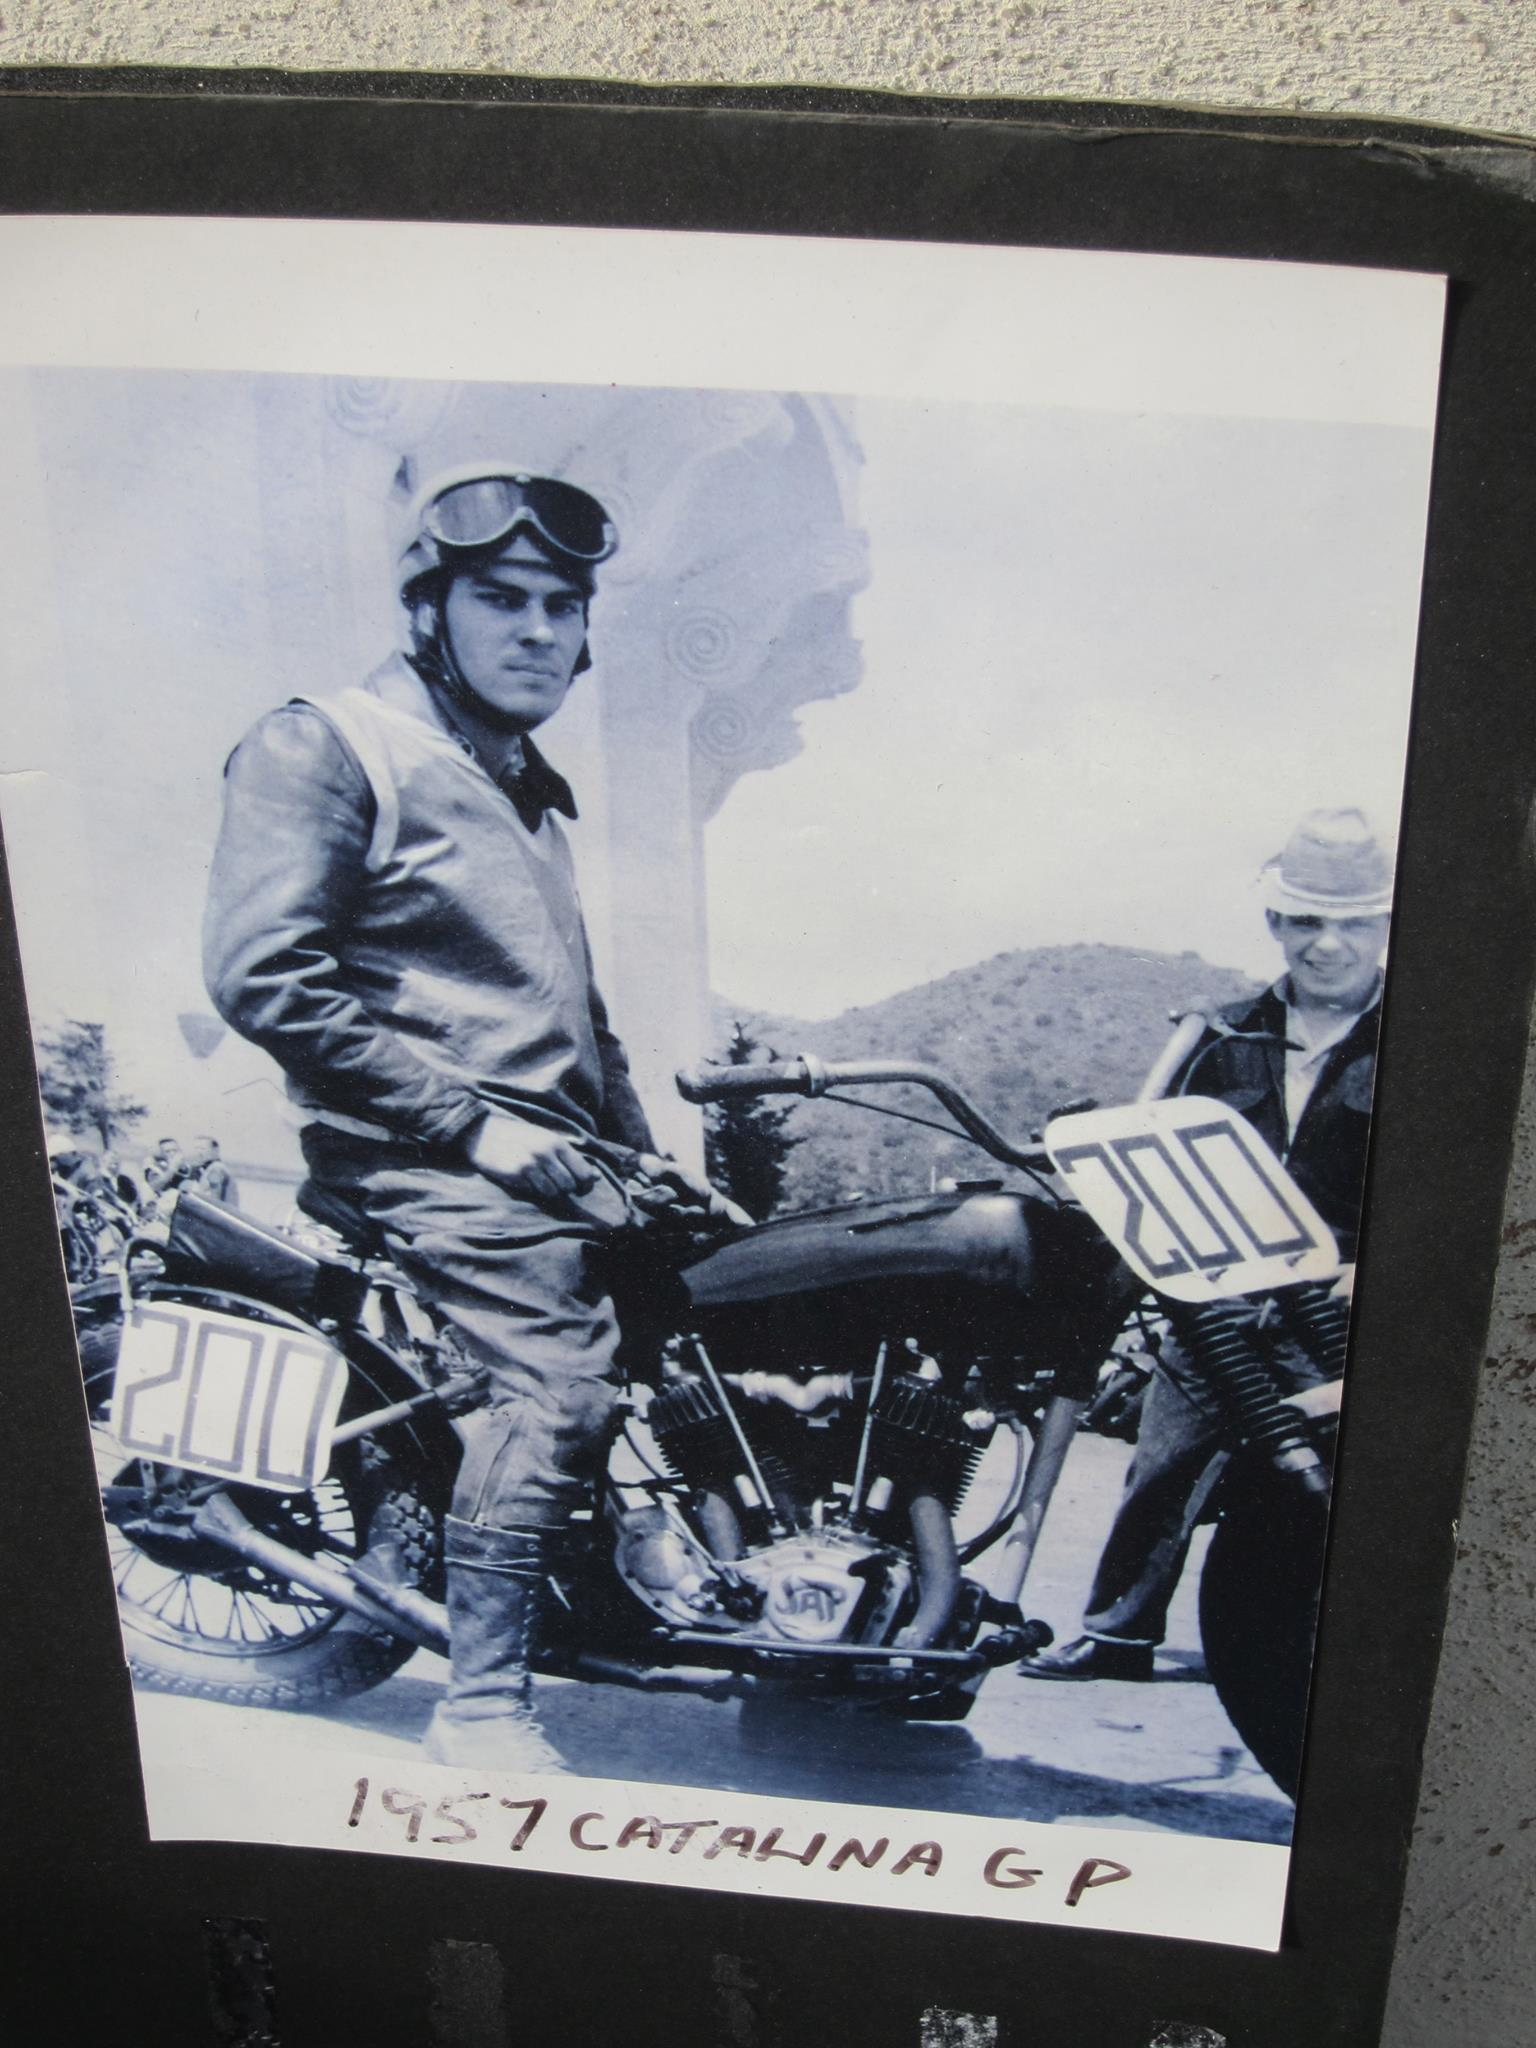 Homer on his 1929 Harley Davidson JD Twin at the 1957 Catalina Grand Prix.